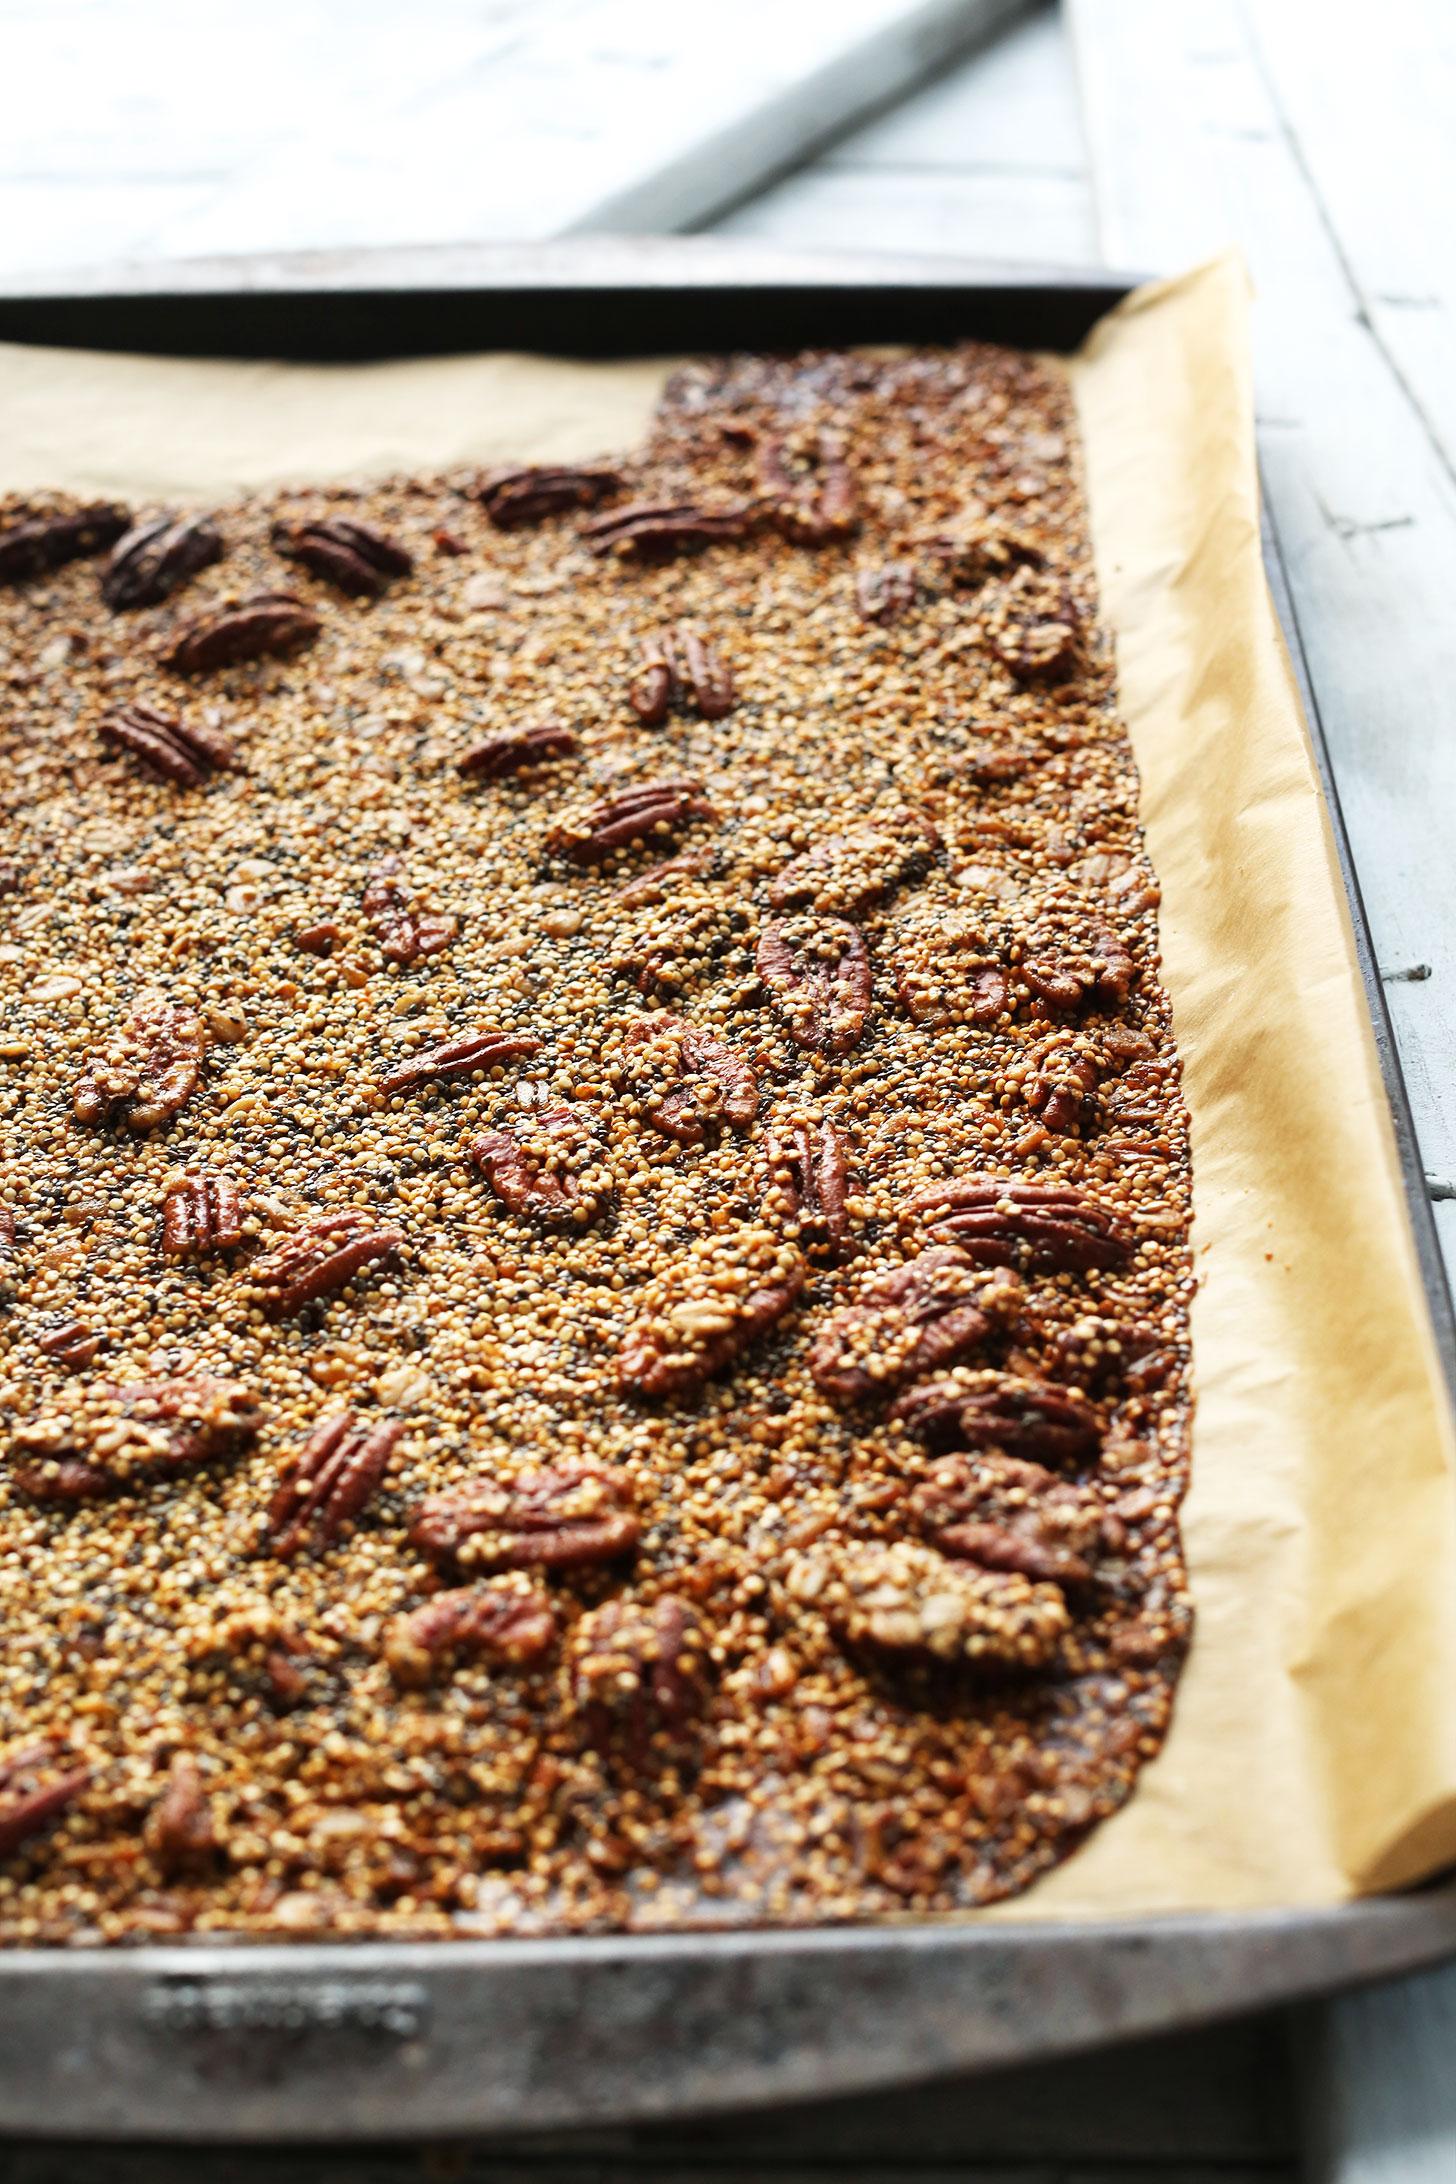 AMAZING Quinoa Brittle that's naturally sweetened, CRISPY and delicious! #vegan #glutenfree #brittle #christmas #dessert #healthy #minimalistbaker